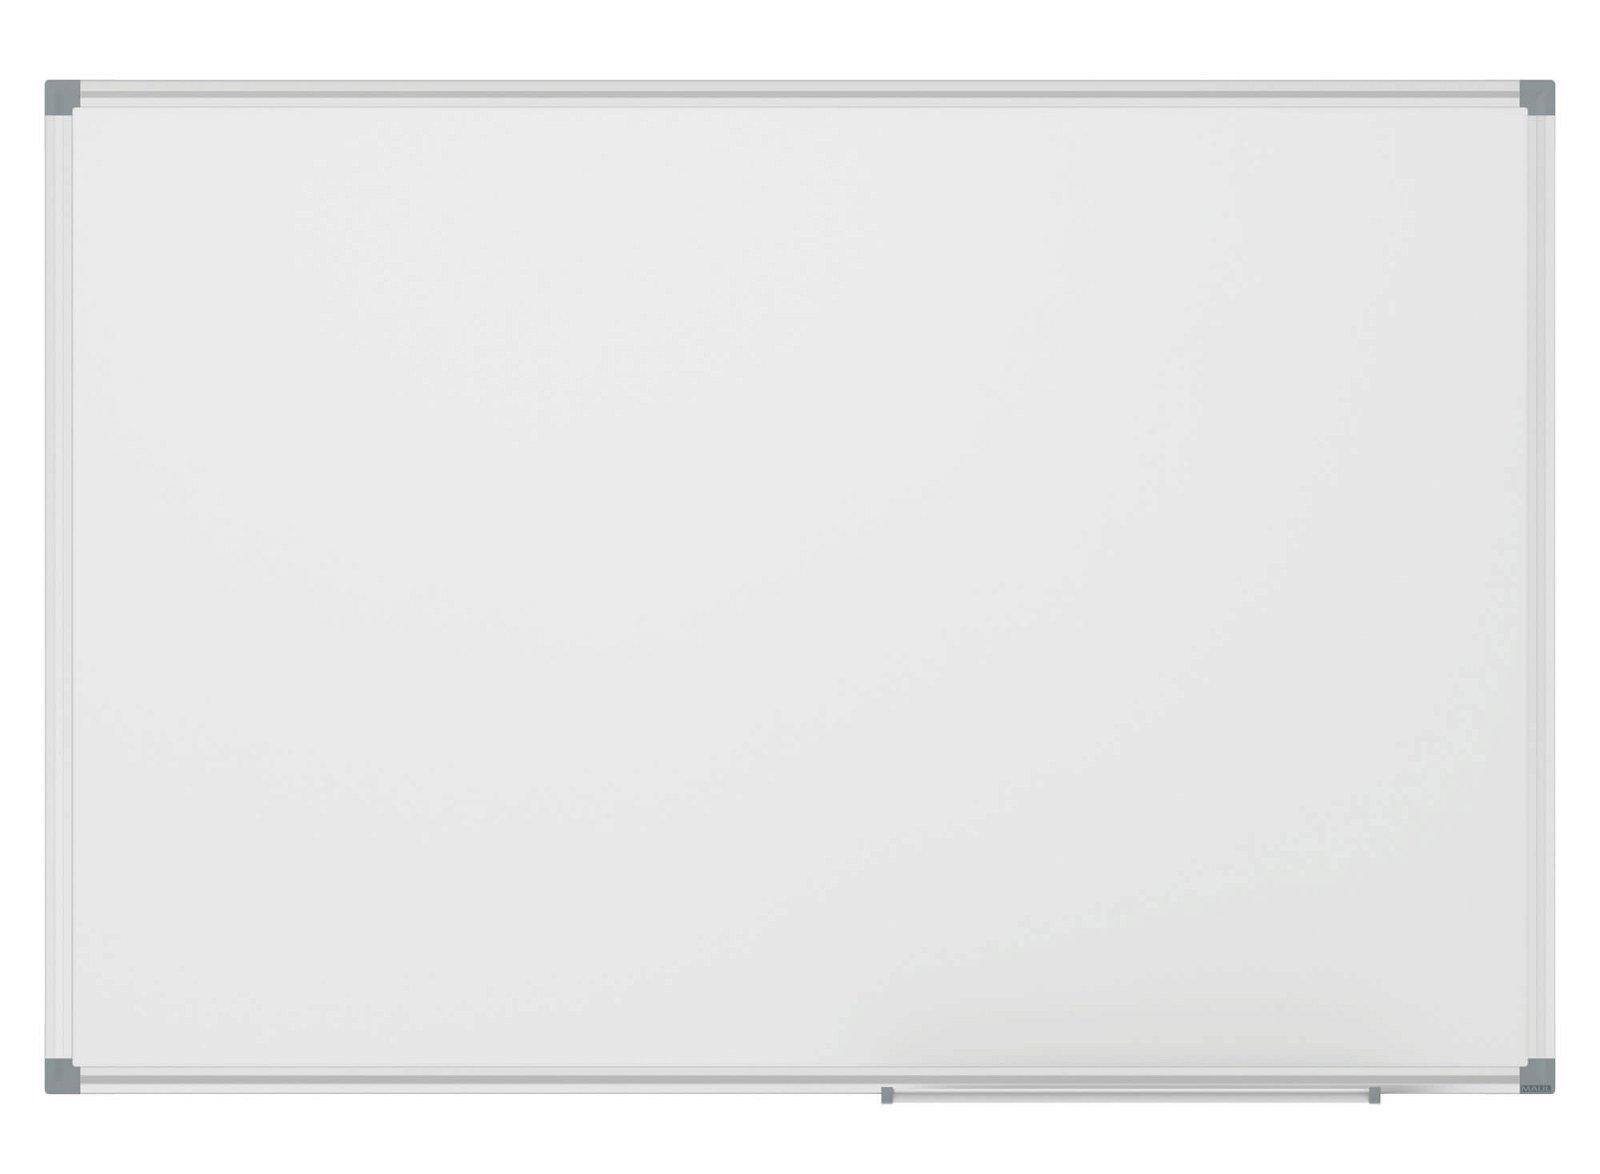 Whiteboard MAULstandard, Emaille, 100x150 cm, grau